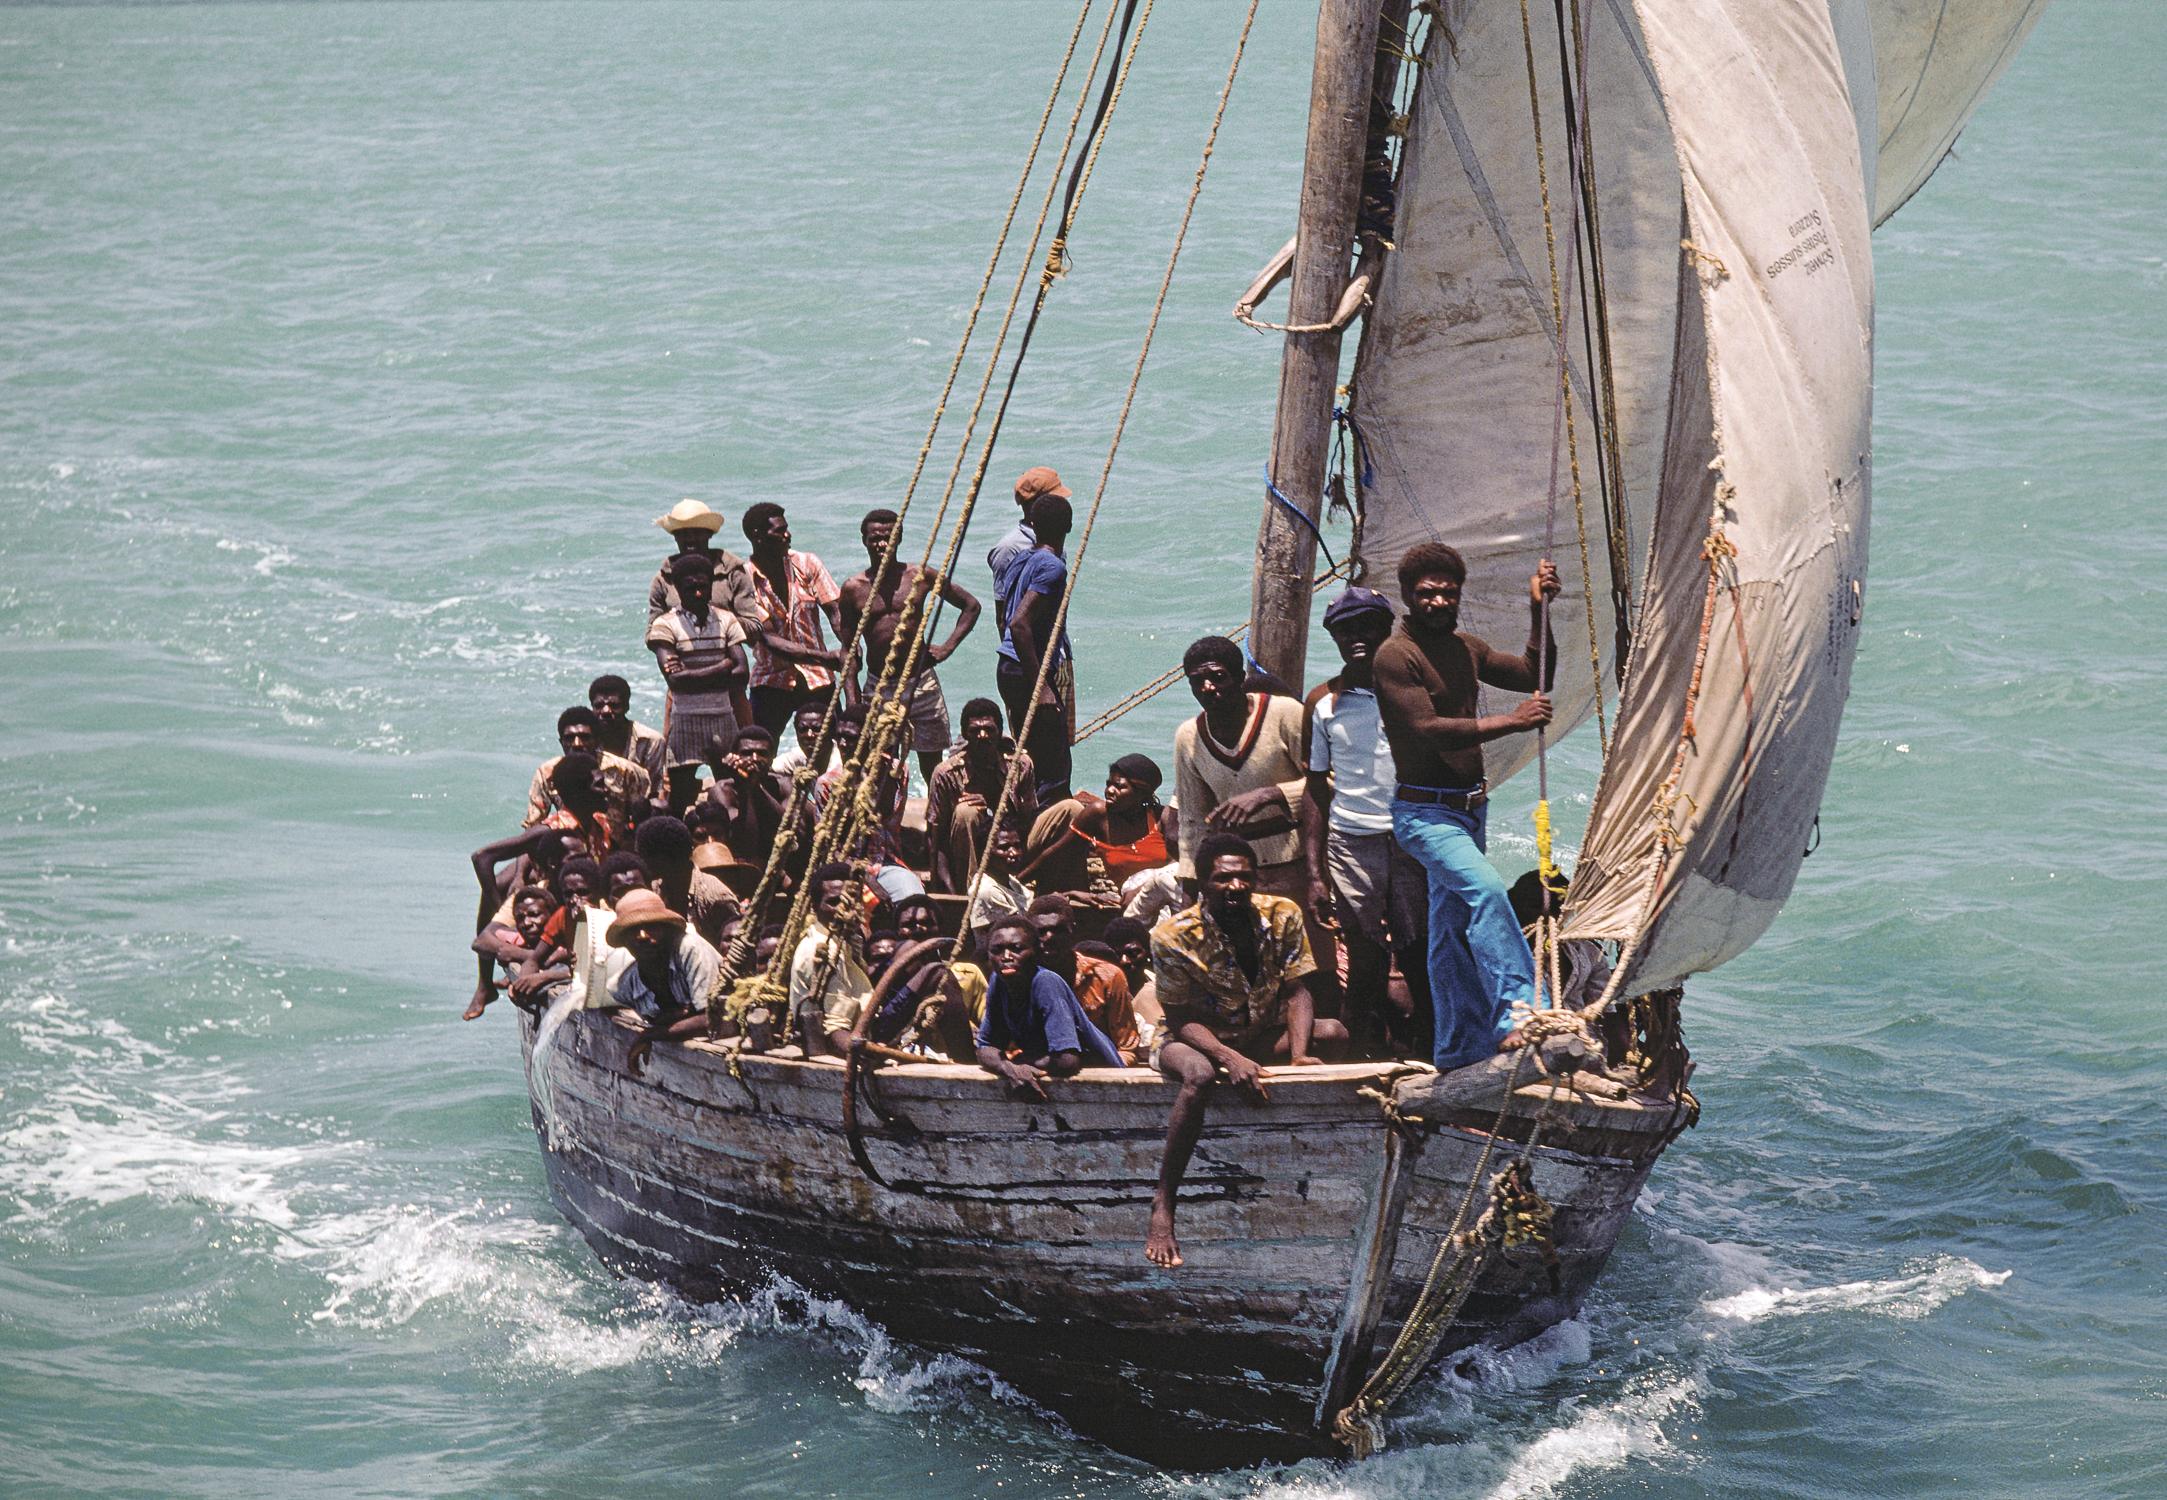 Refugees from Haiti sail into Biscayne Bay   Refugiados de Haití zarpan hacia Biscayne Bay